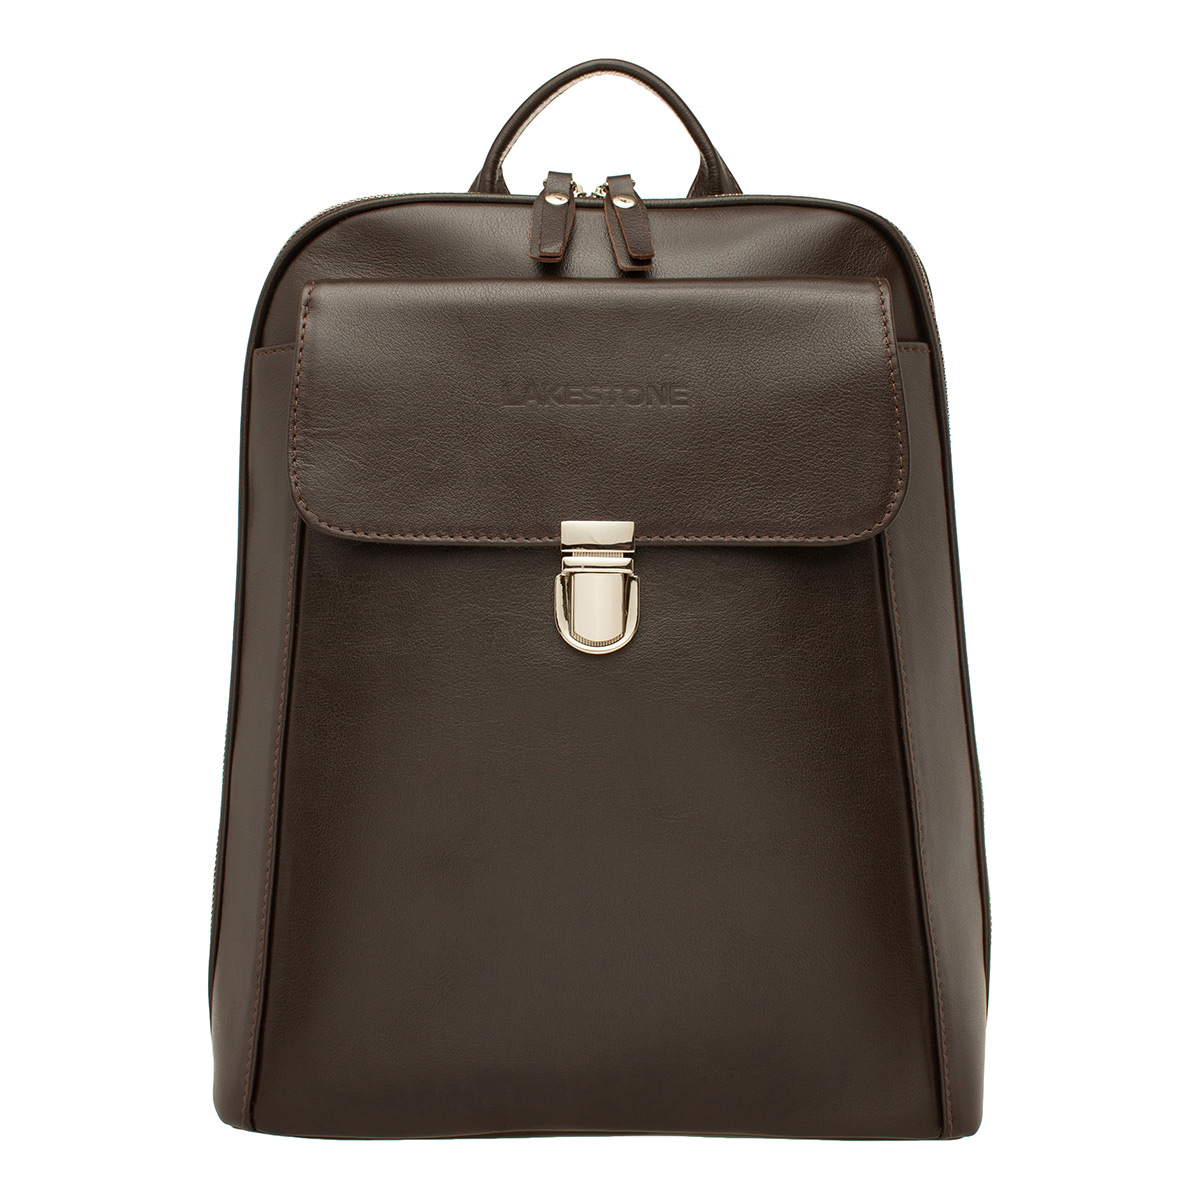 Рюкзак женский LAKESTONE 915898 коричневый фото